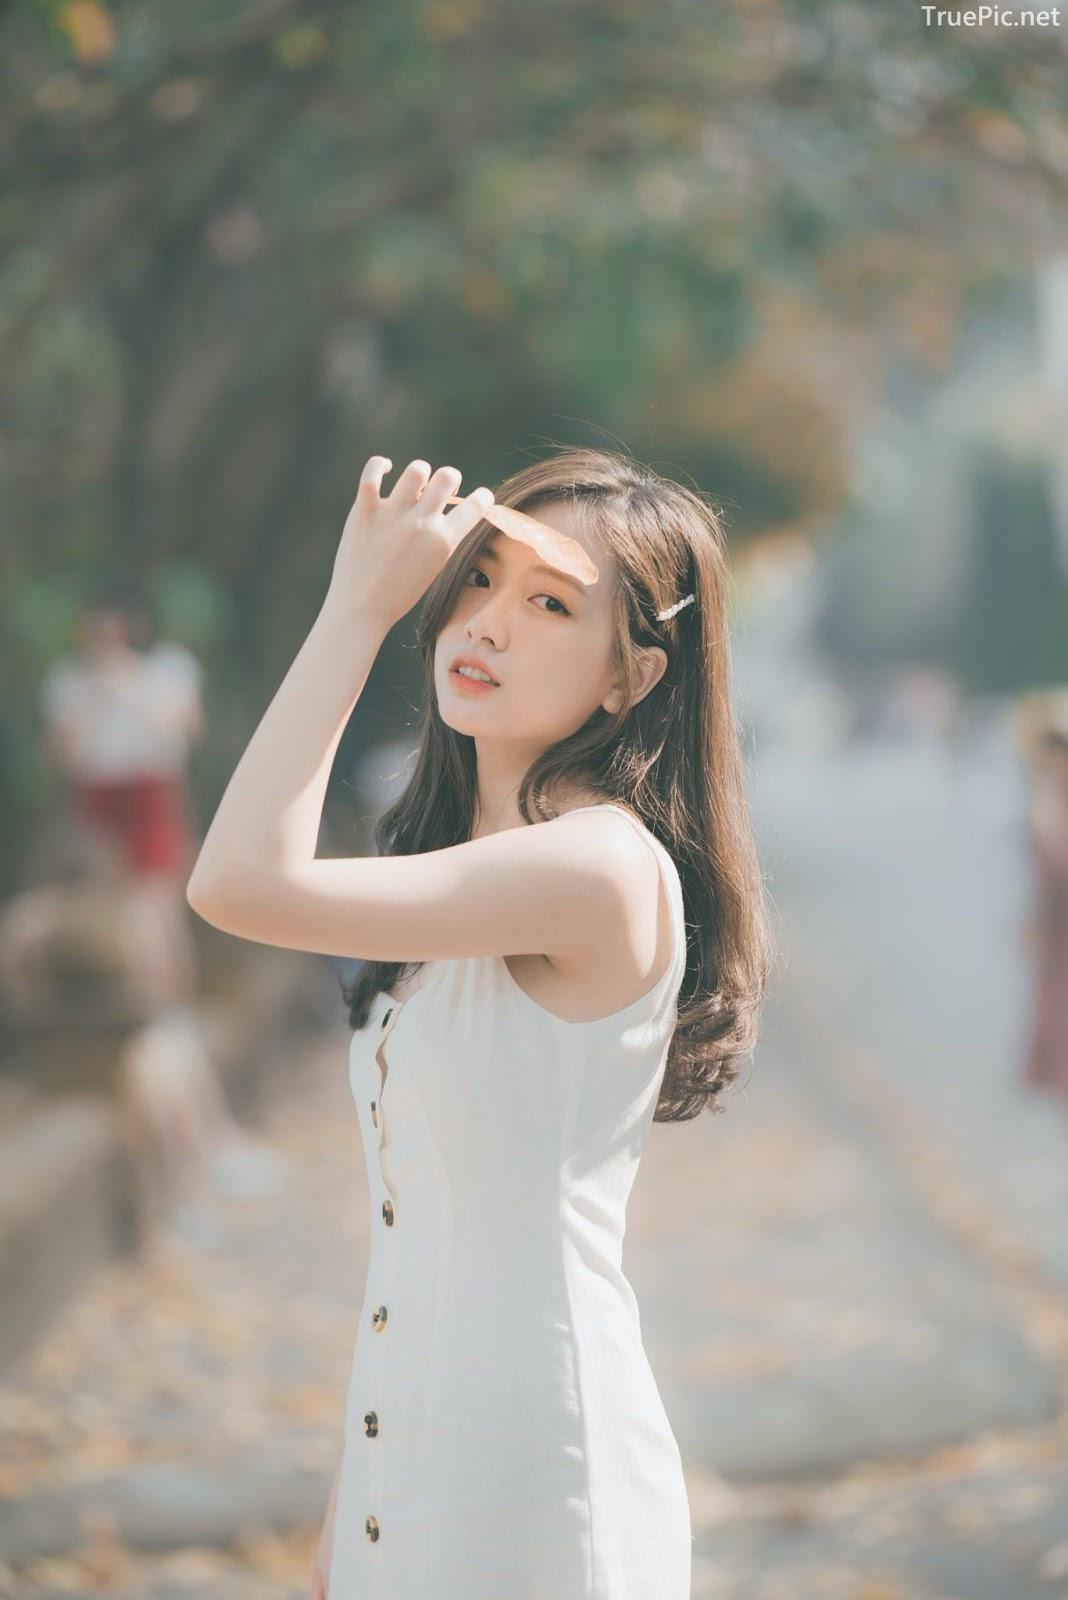 Vietnamese Hot Girl Linh Hoai - Season of falling leaves - TruePic.net - Picture 2